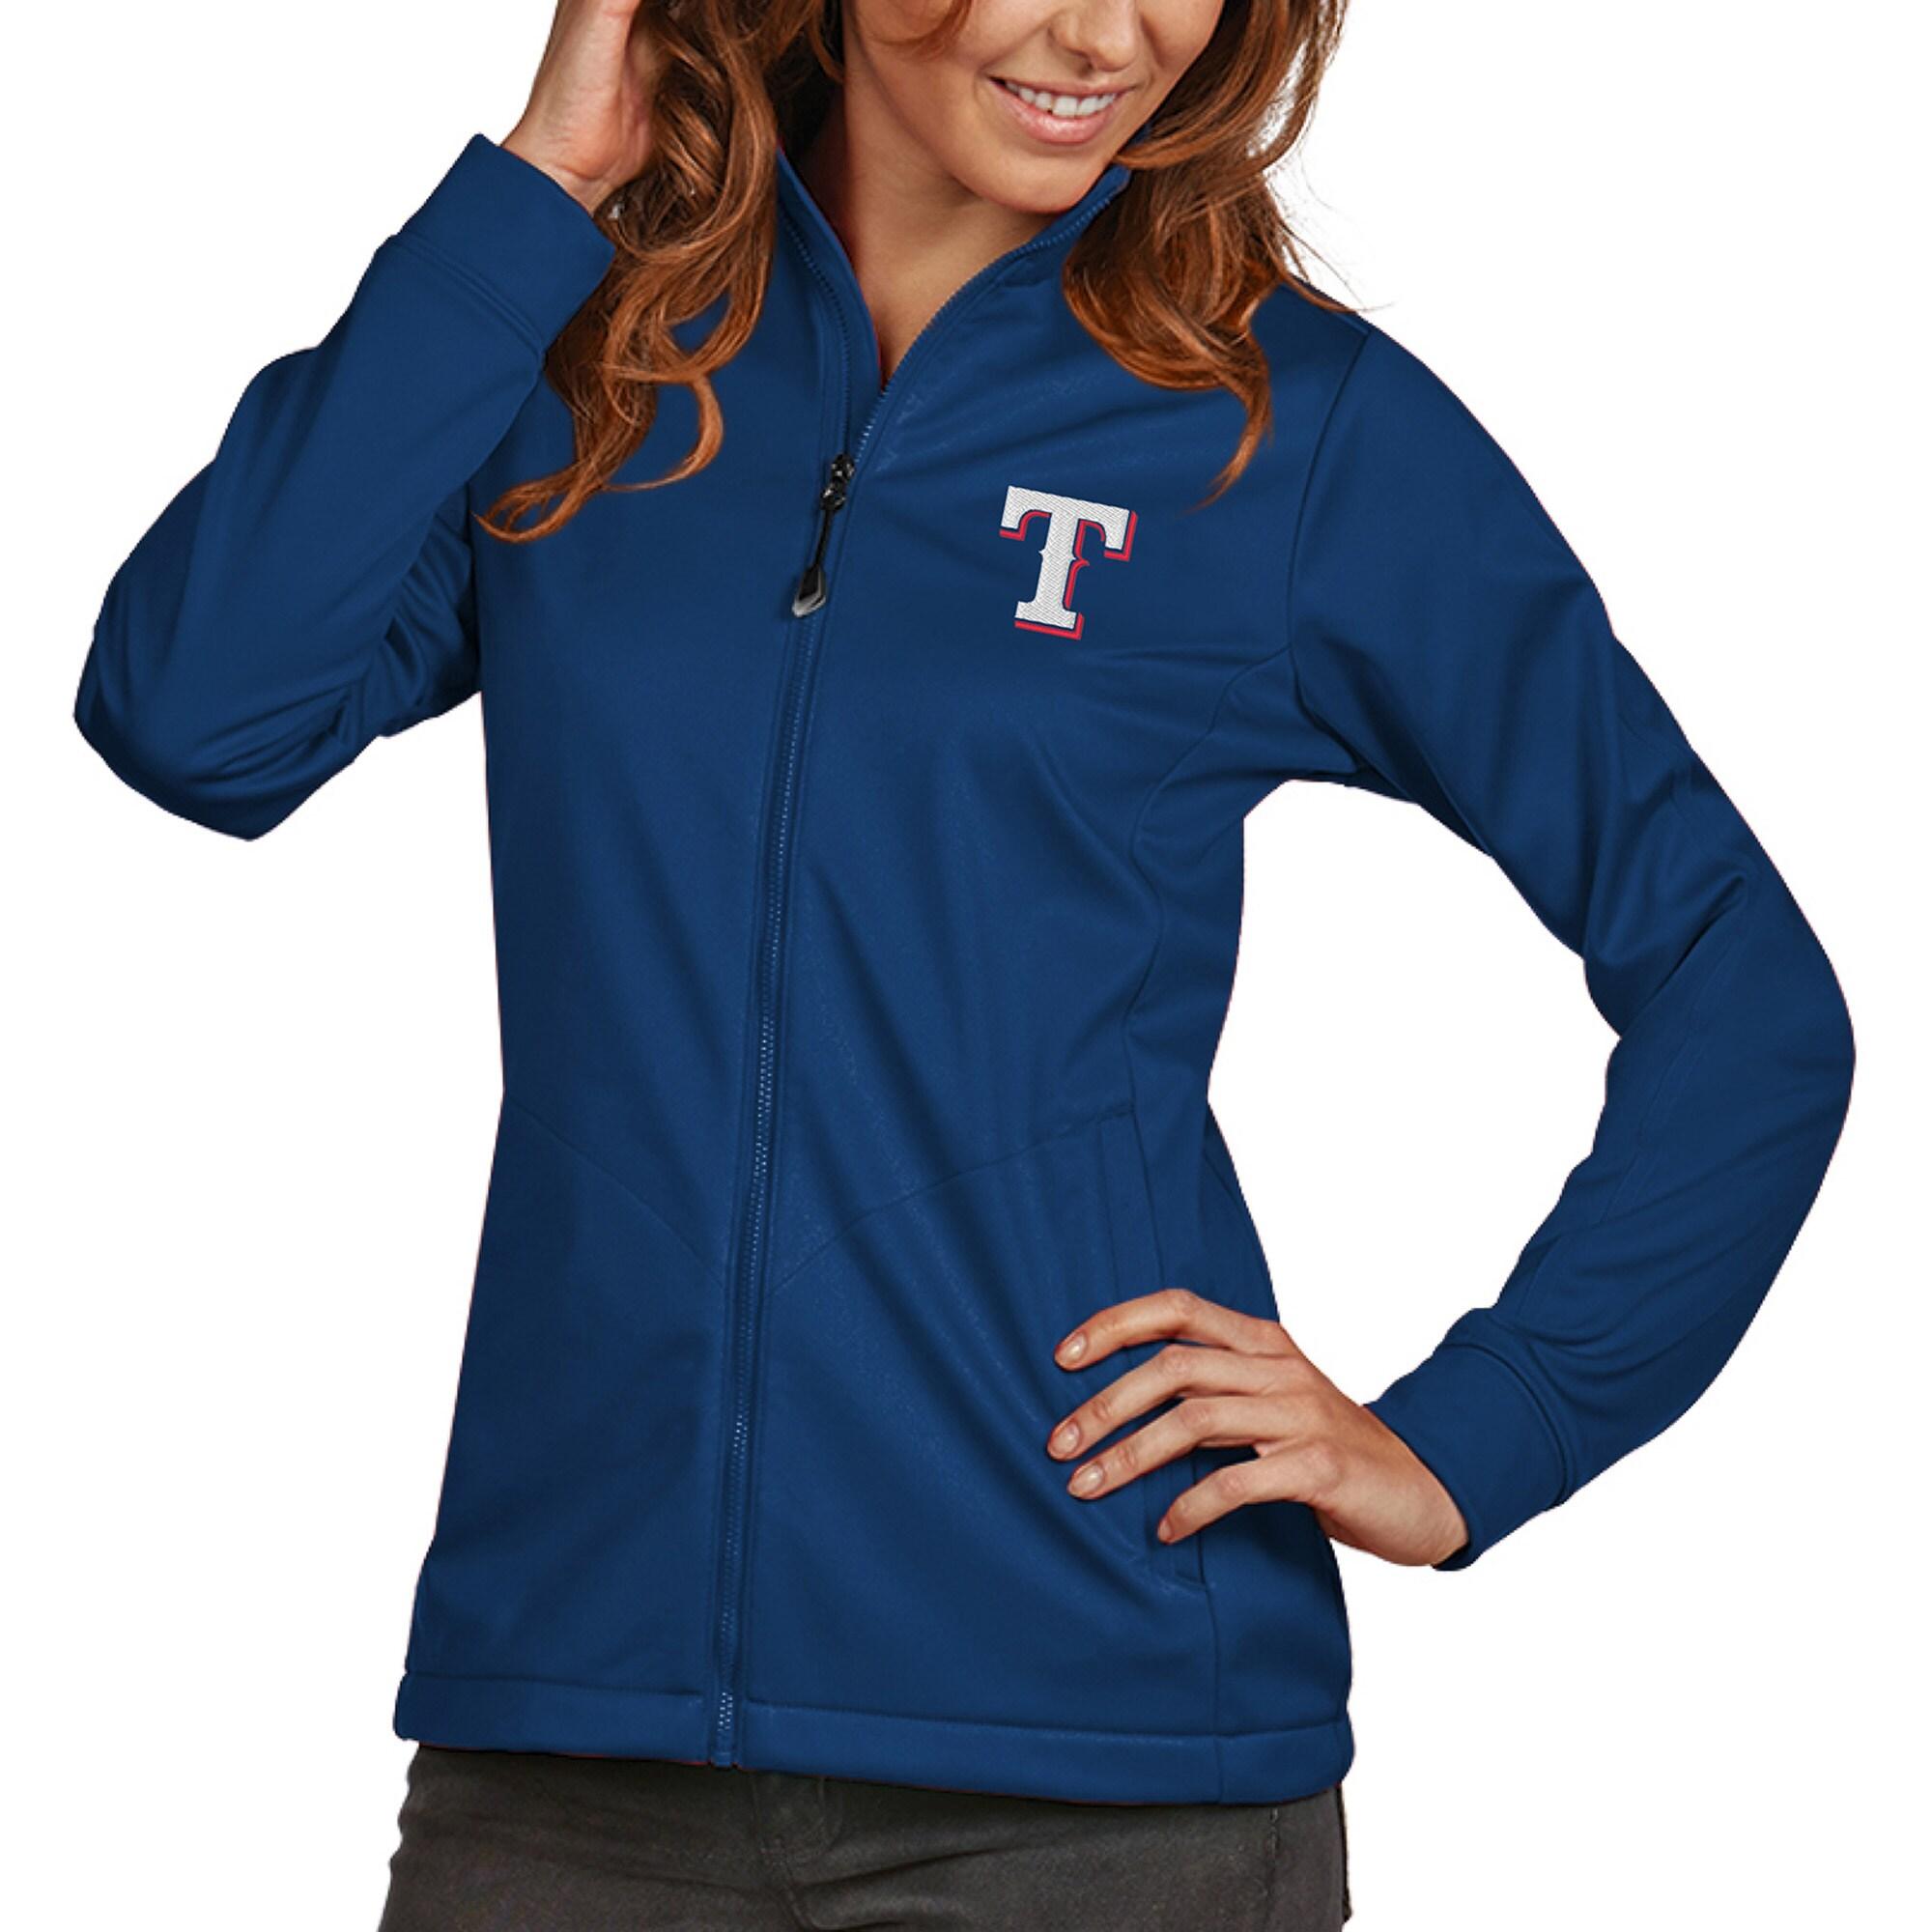 Texas Rangers Antigua Women's Golf Full-Zip Jacket - Royal